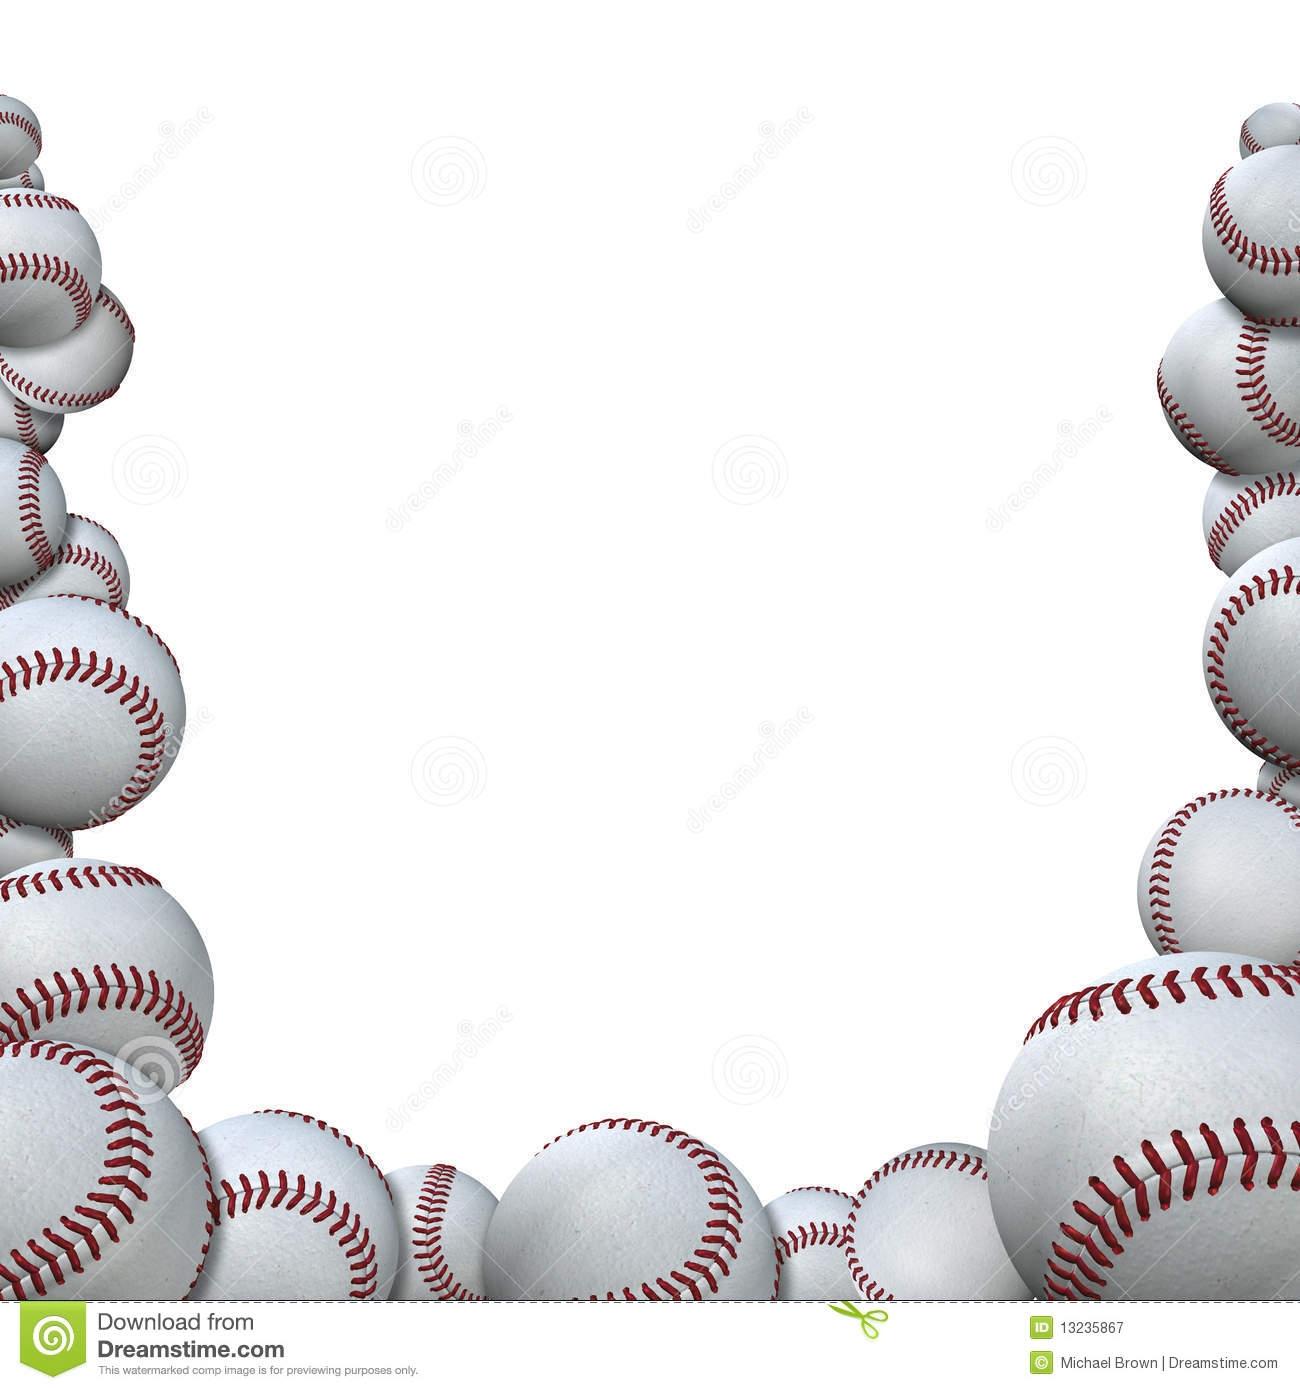 Baseball Border Clipart Free.